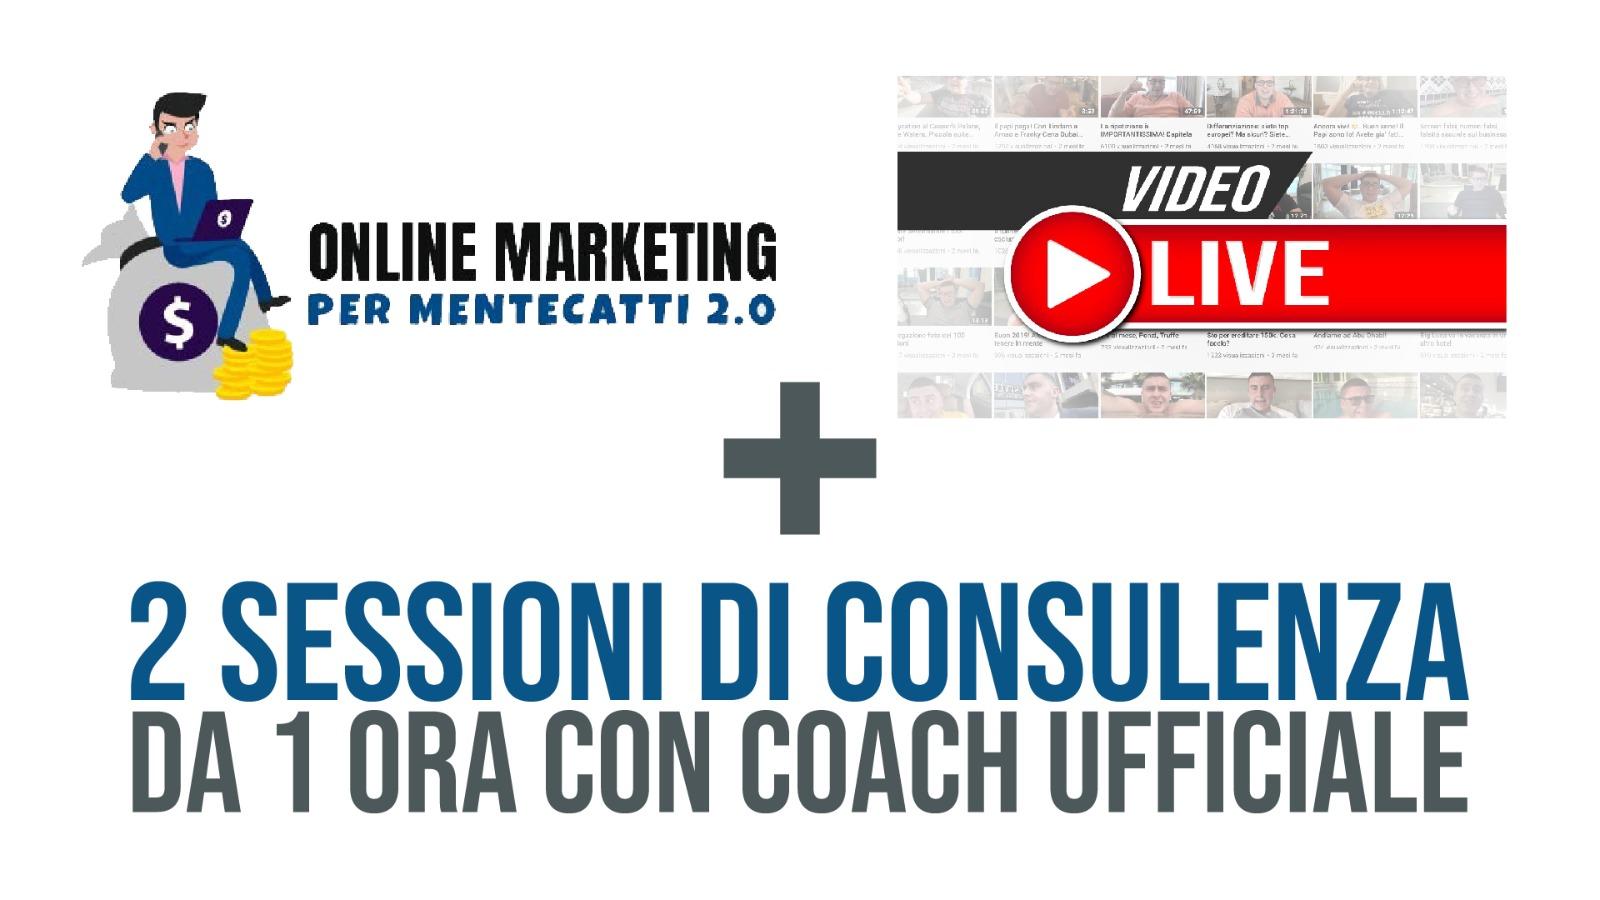 Online Marketing per Mentecatti 2.0 - Guru Edition